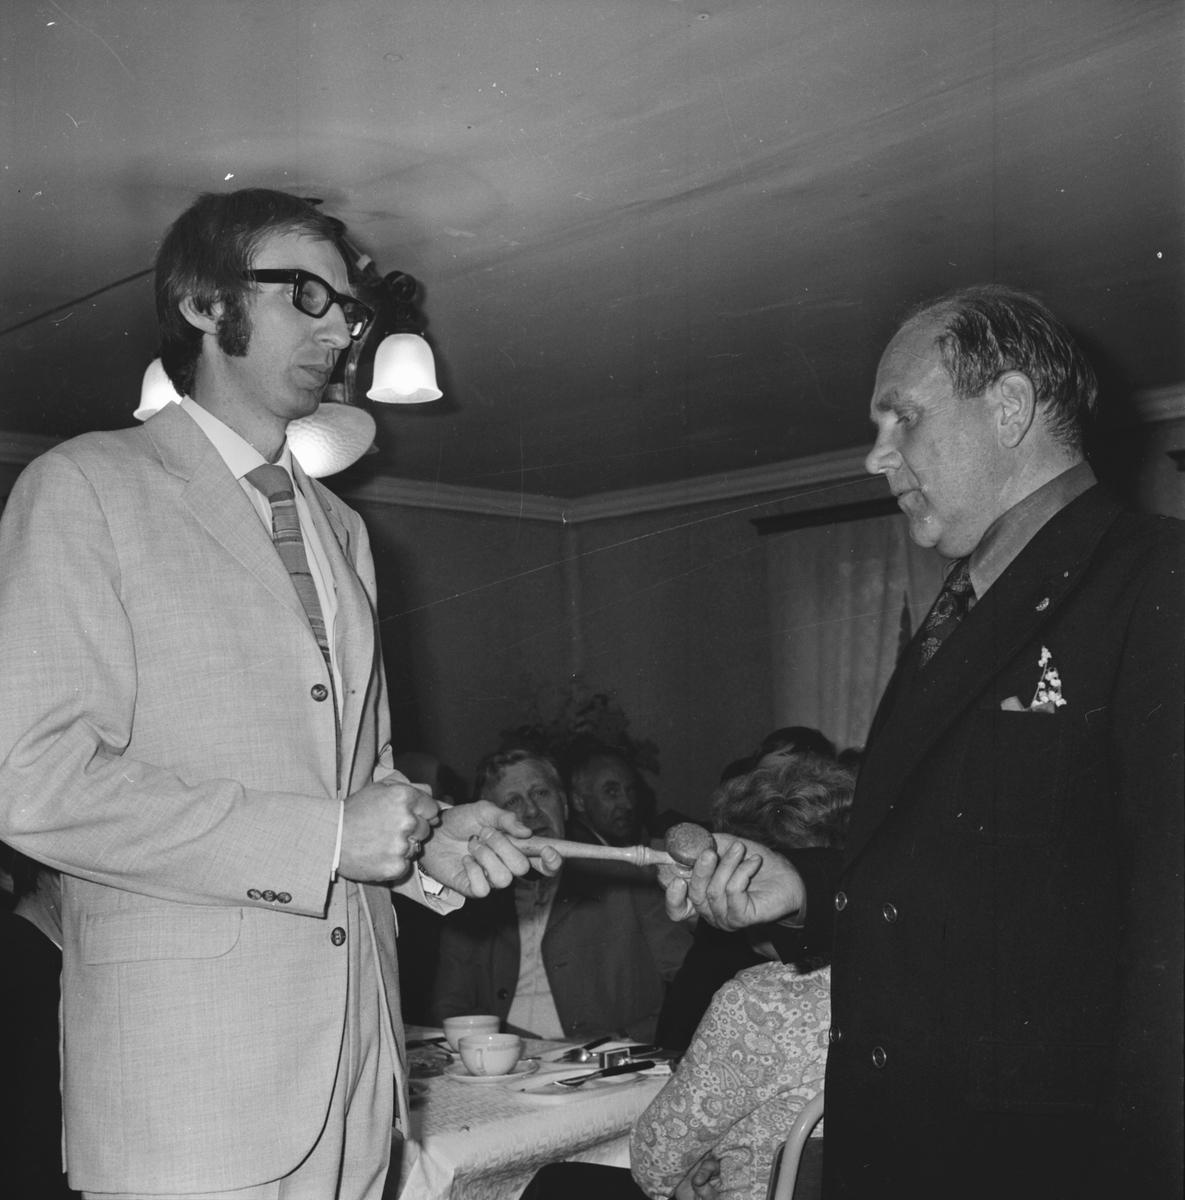 Arbrå Lion, Presidentbyte 1972